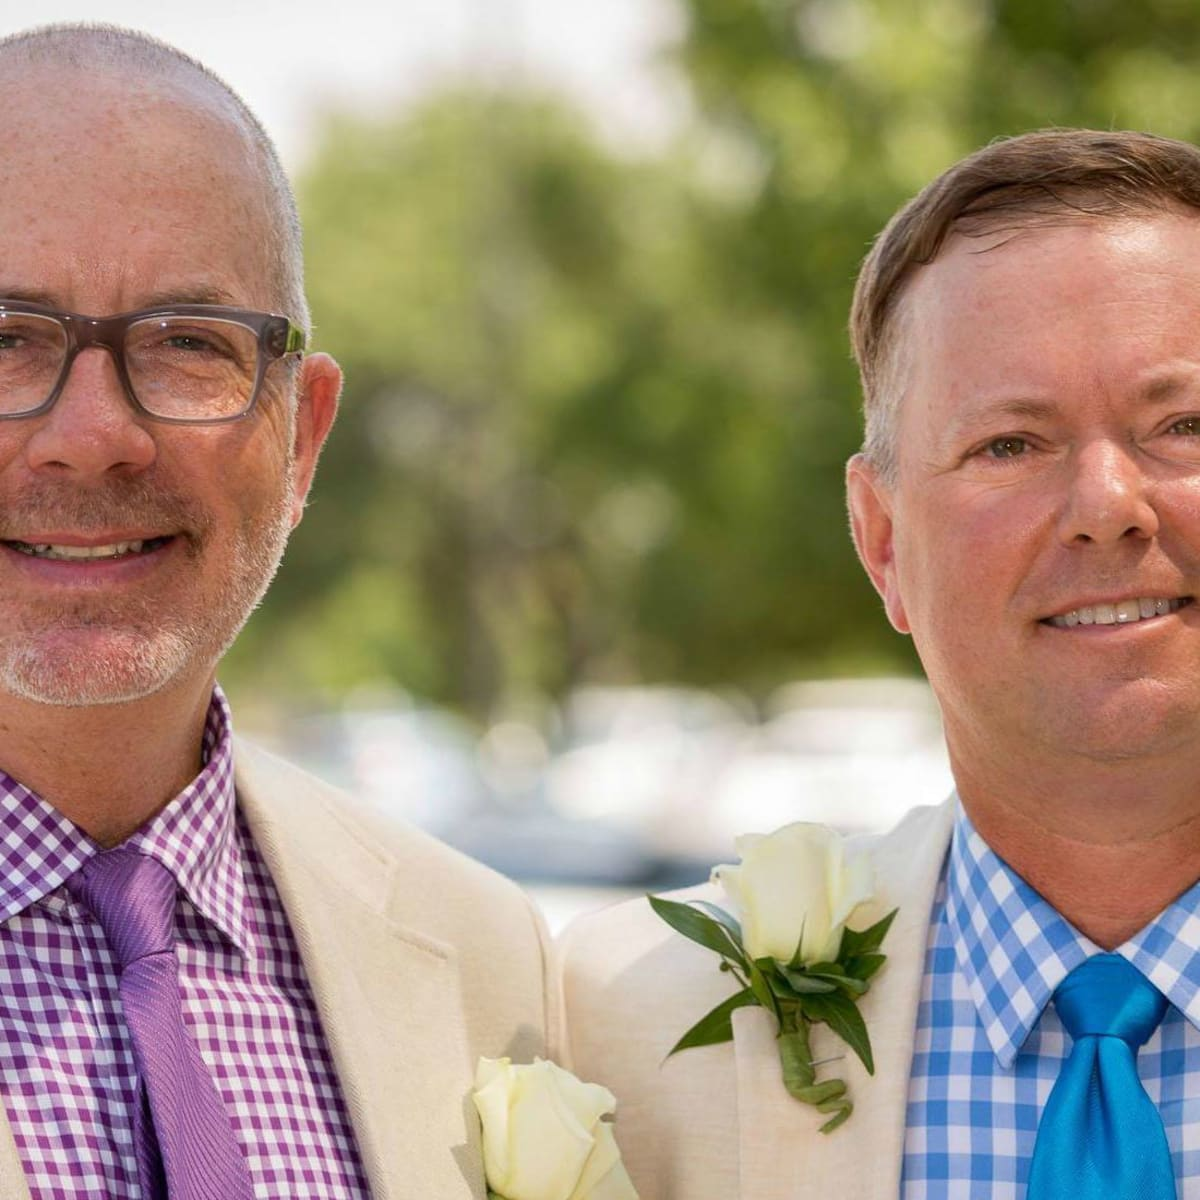 Austin gay couple married Travis County Darin Upchurch Charles Ted Burton headshot 2015